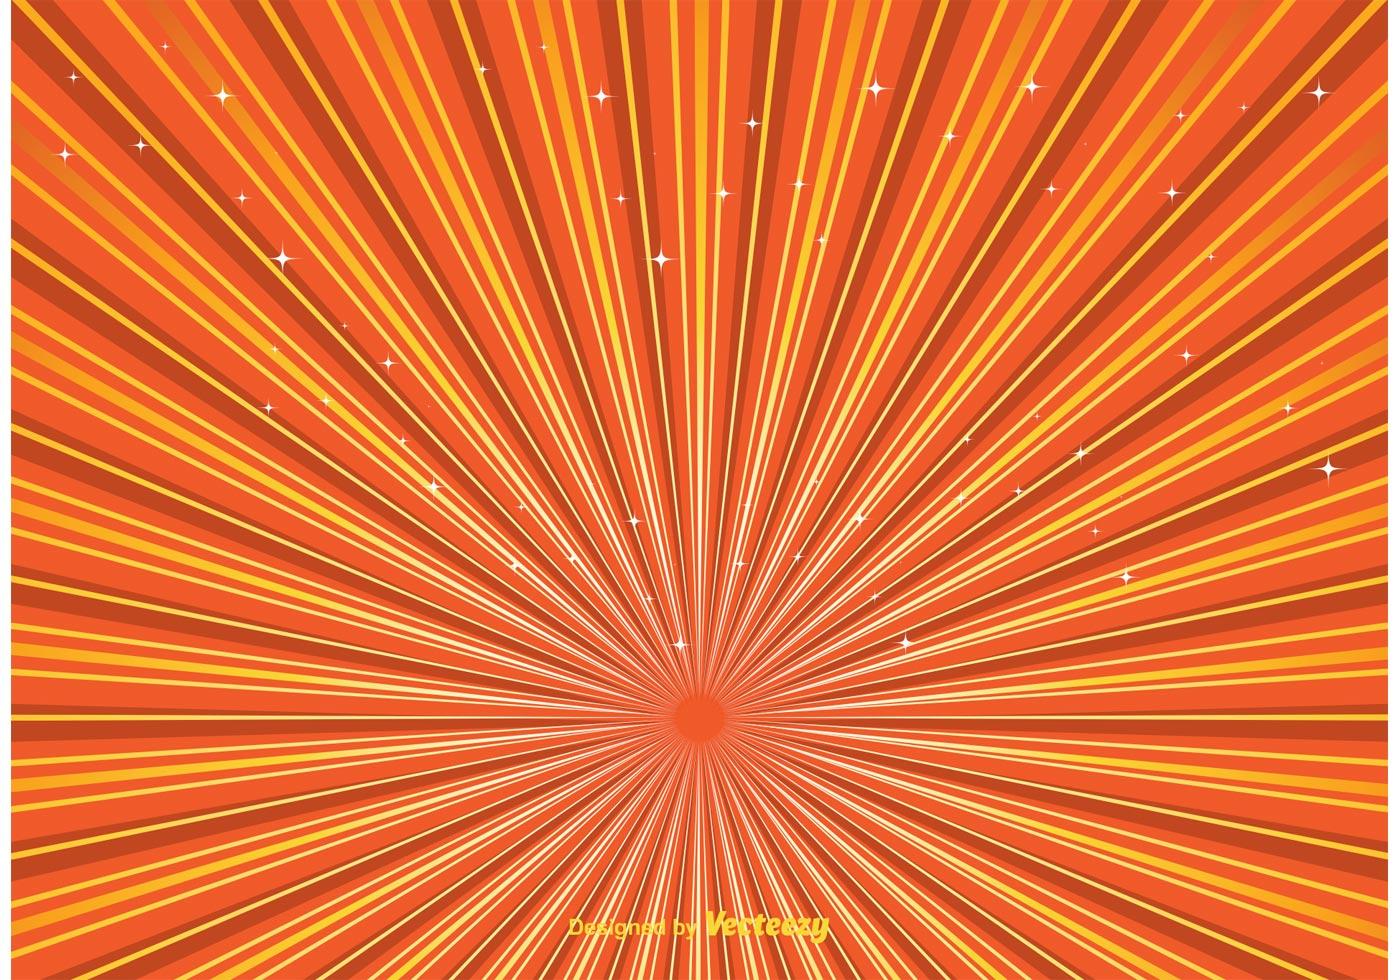 Sunburst Background Vector Download Free Art